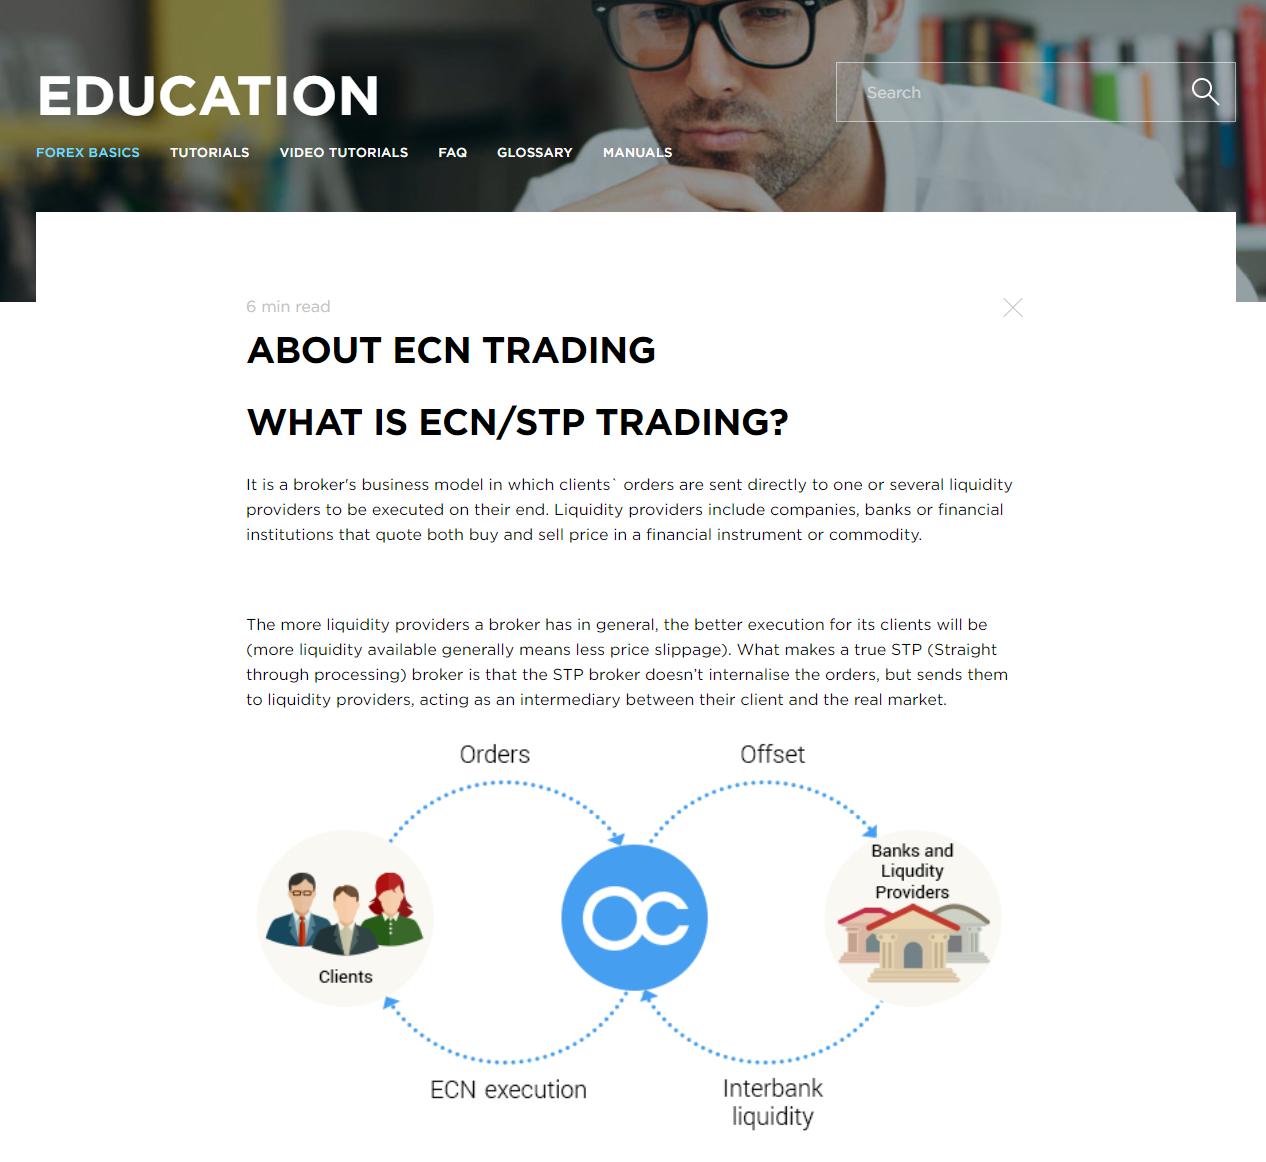 OctaFX Education